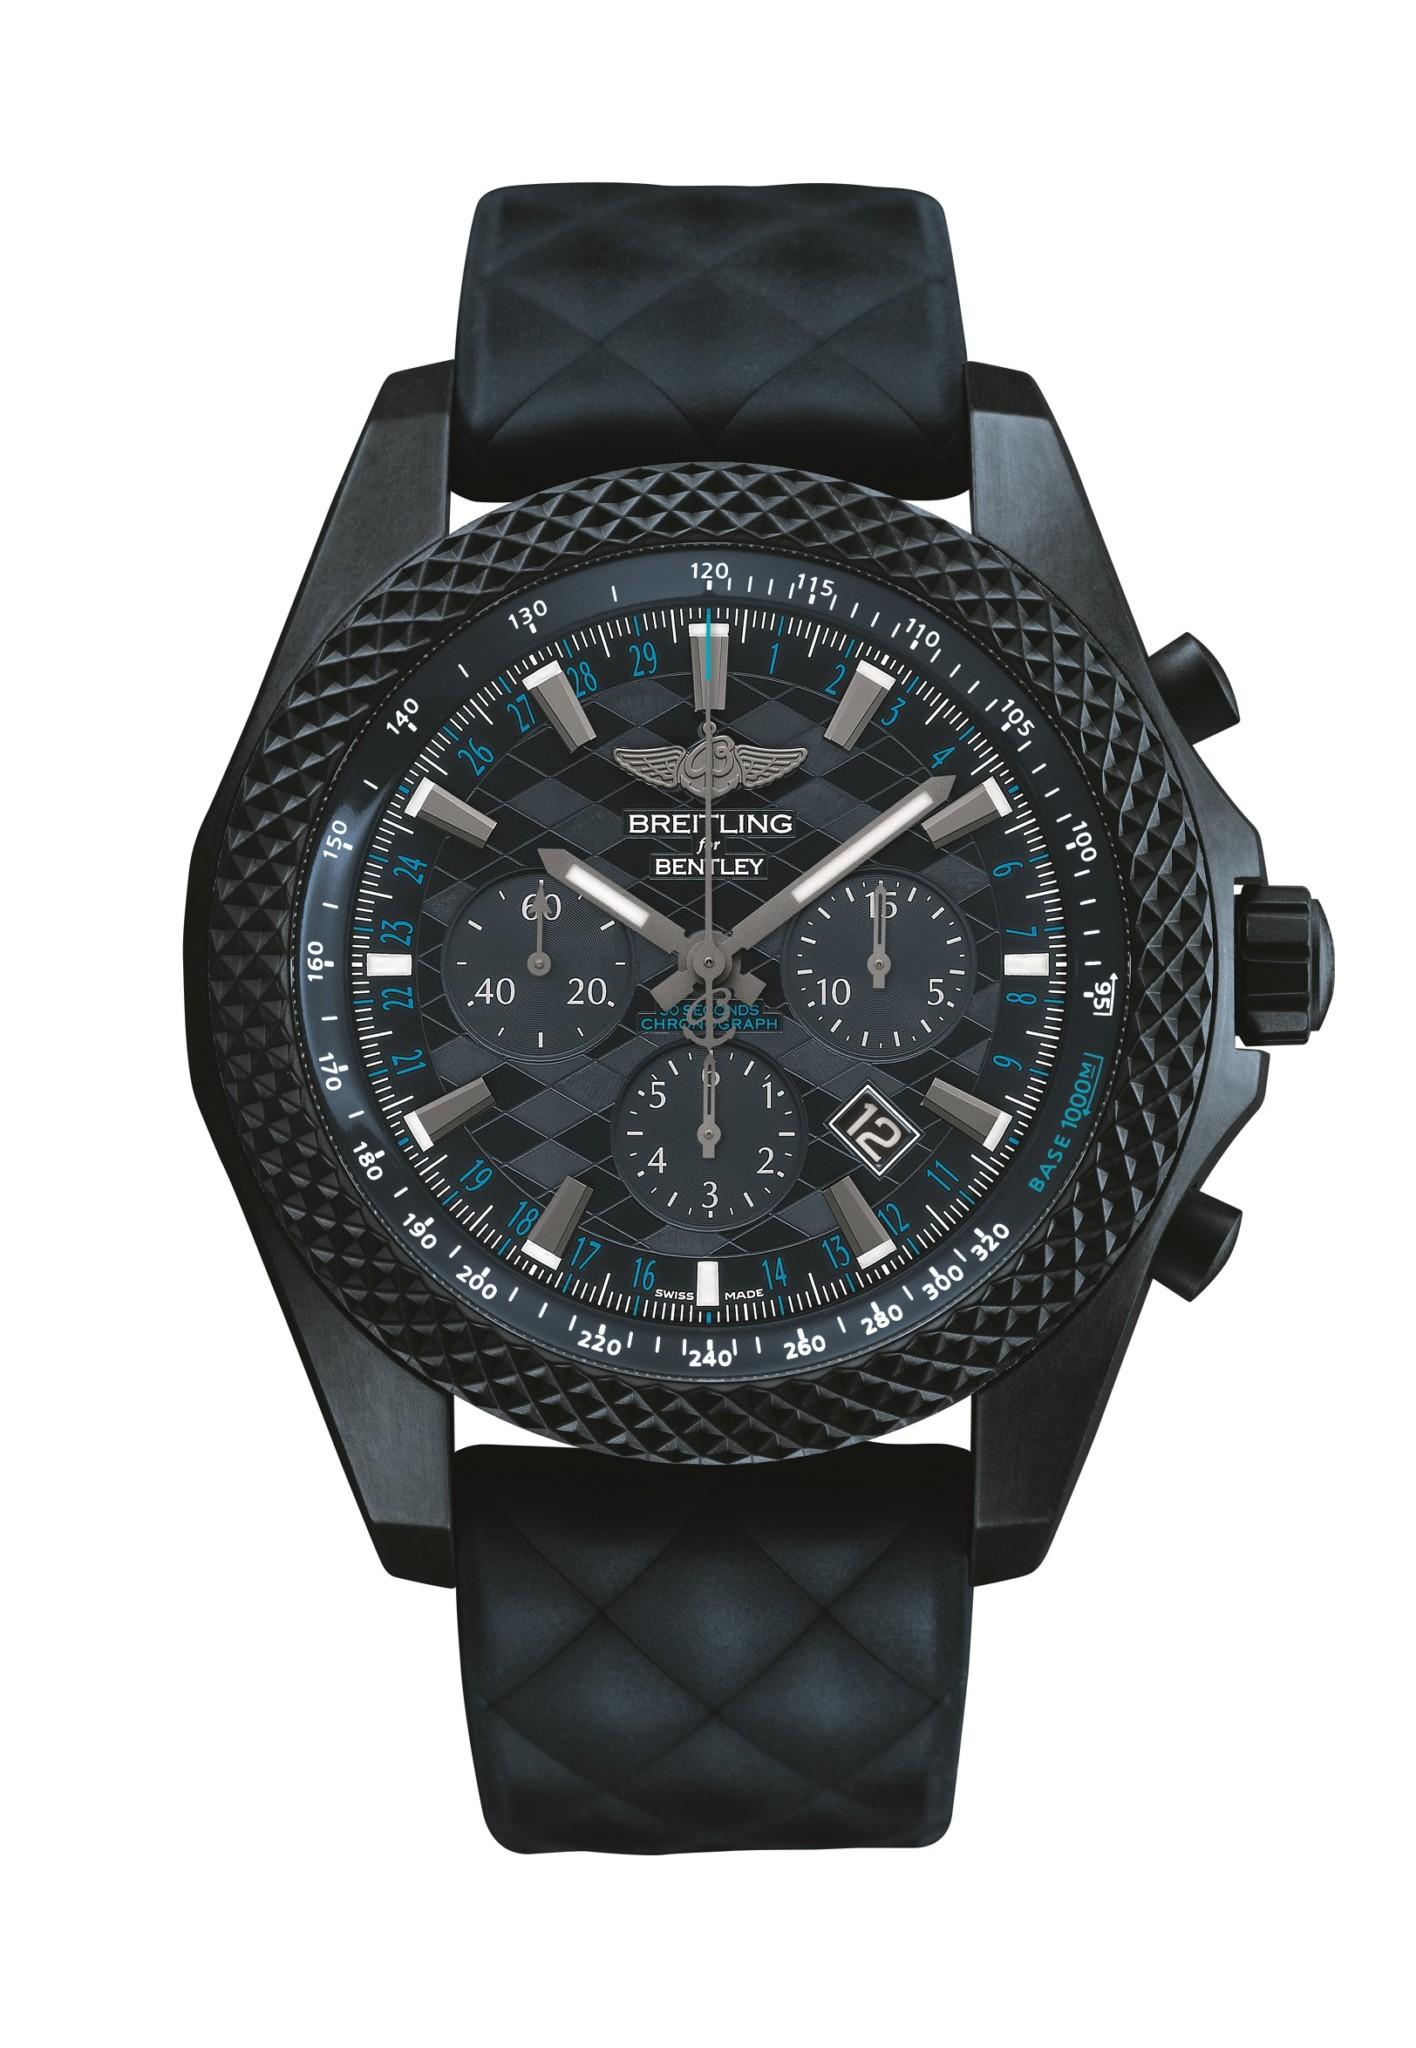 NEW Bentley GT Dark Sapphire Edition